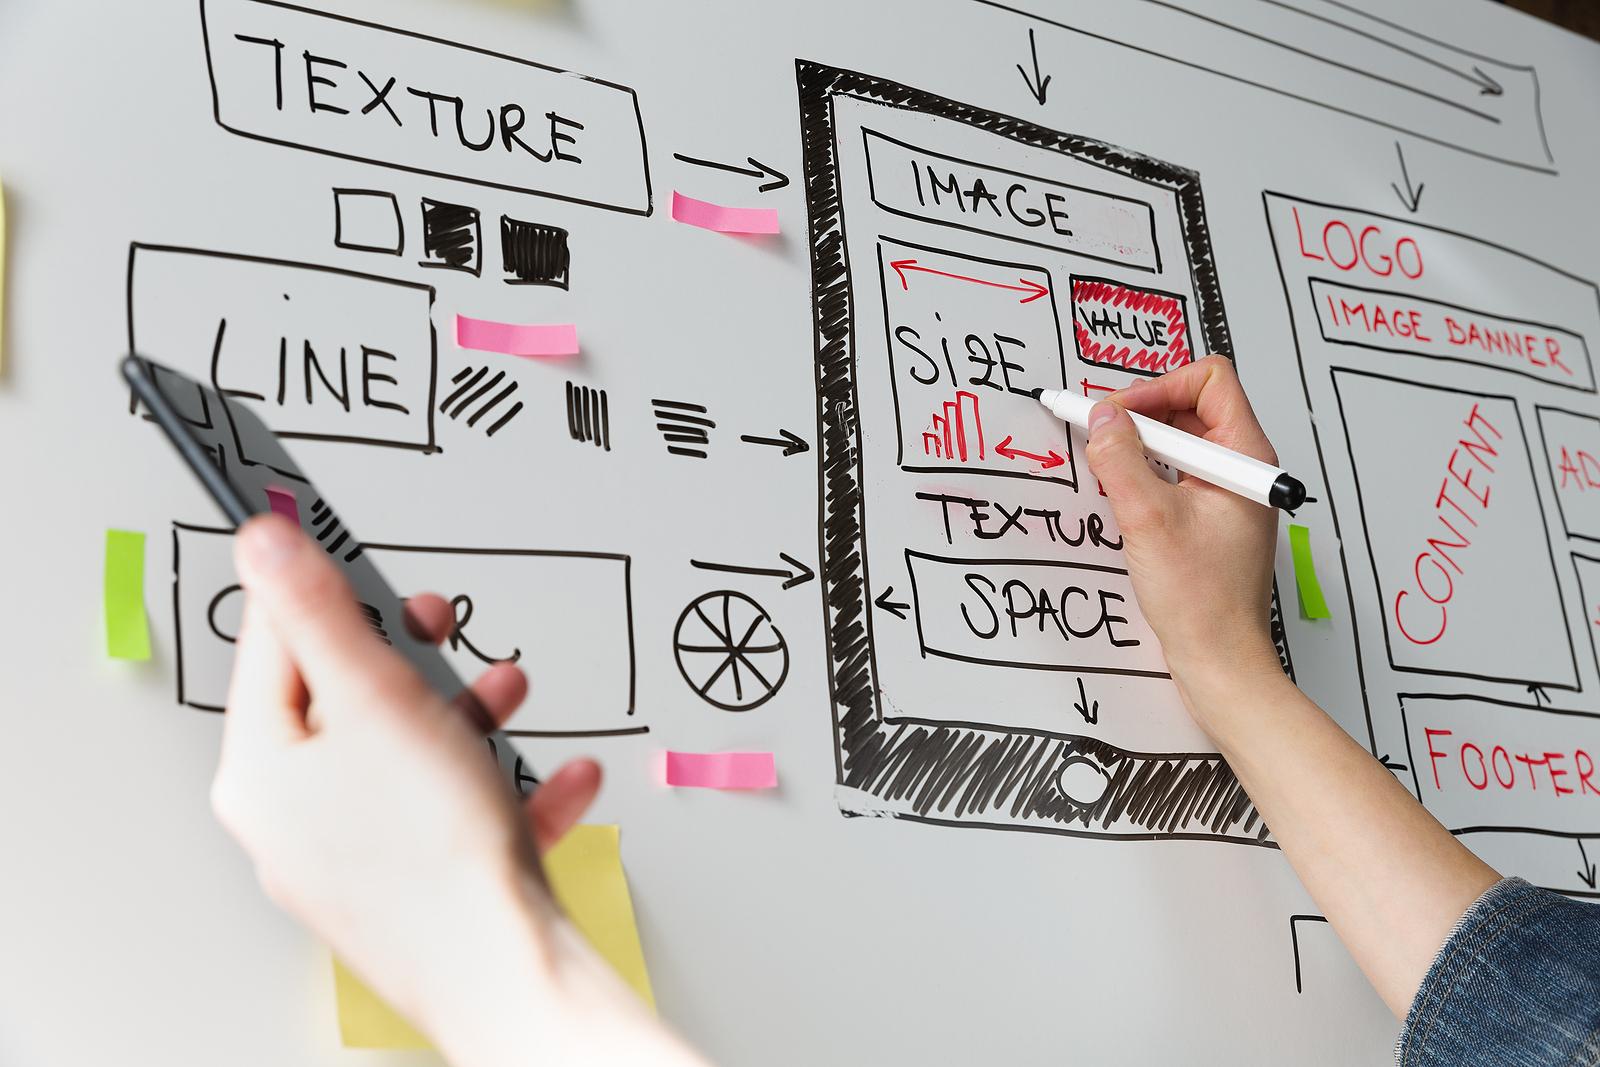 Website designer drawing website template on white board.